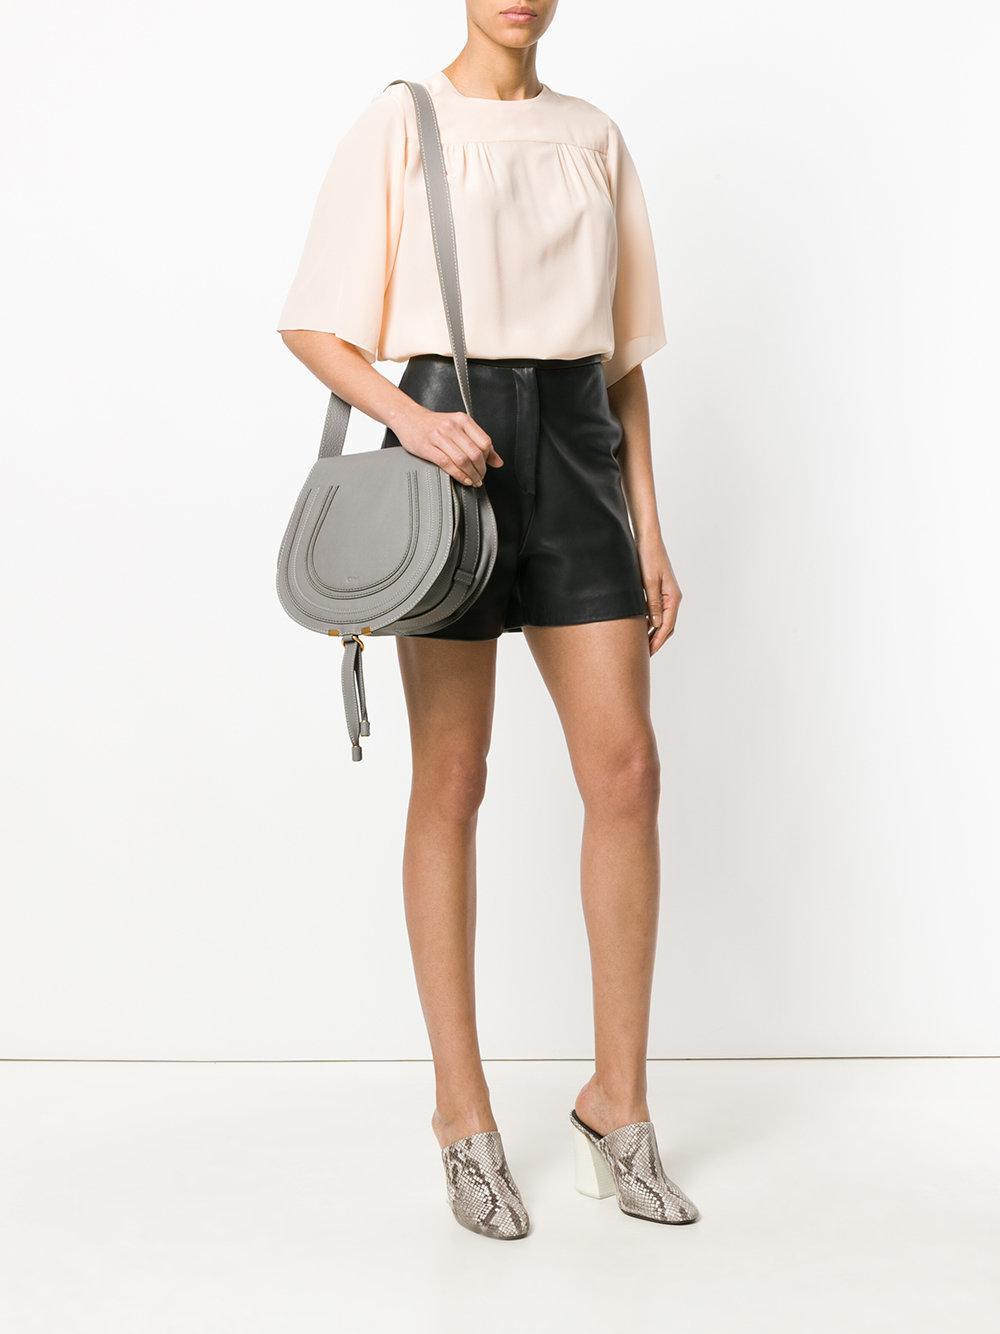 7ec3761873 Lyst - Chloé Marcie Shoulder Bag in Gray - Save 7%